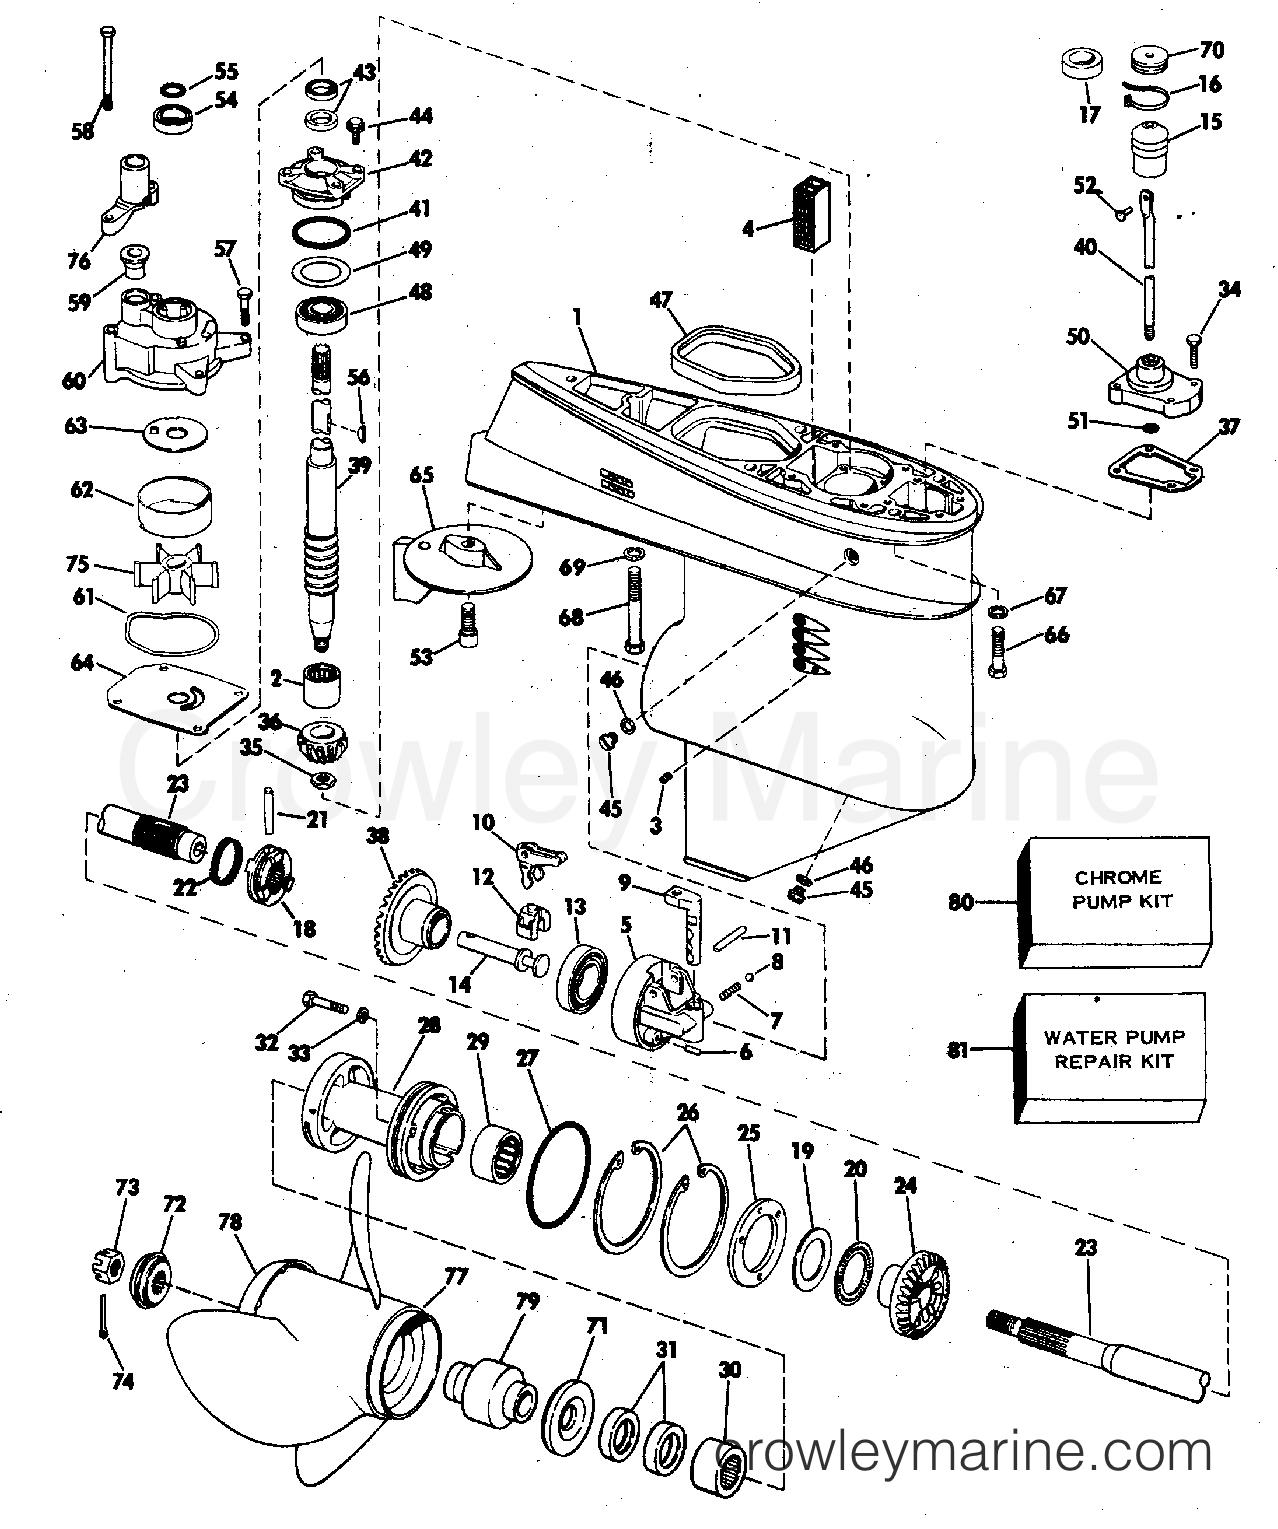 gearcase 1976 evinrude outboards 55 55642e crowley marineand move the diagram 1976 evinrude outboards 55 55642e gearcase section